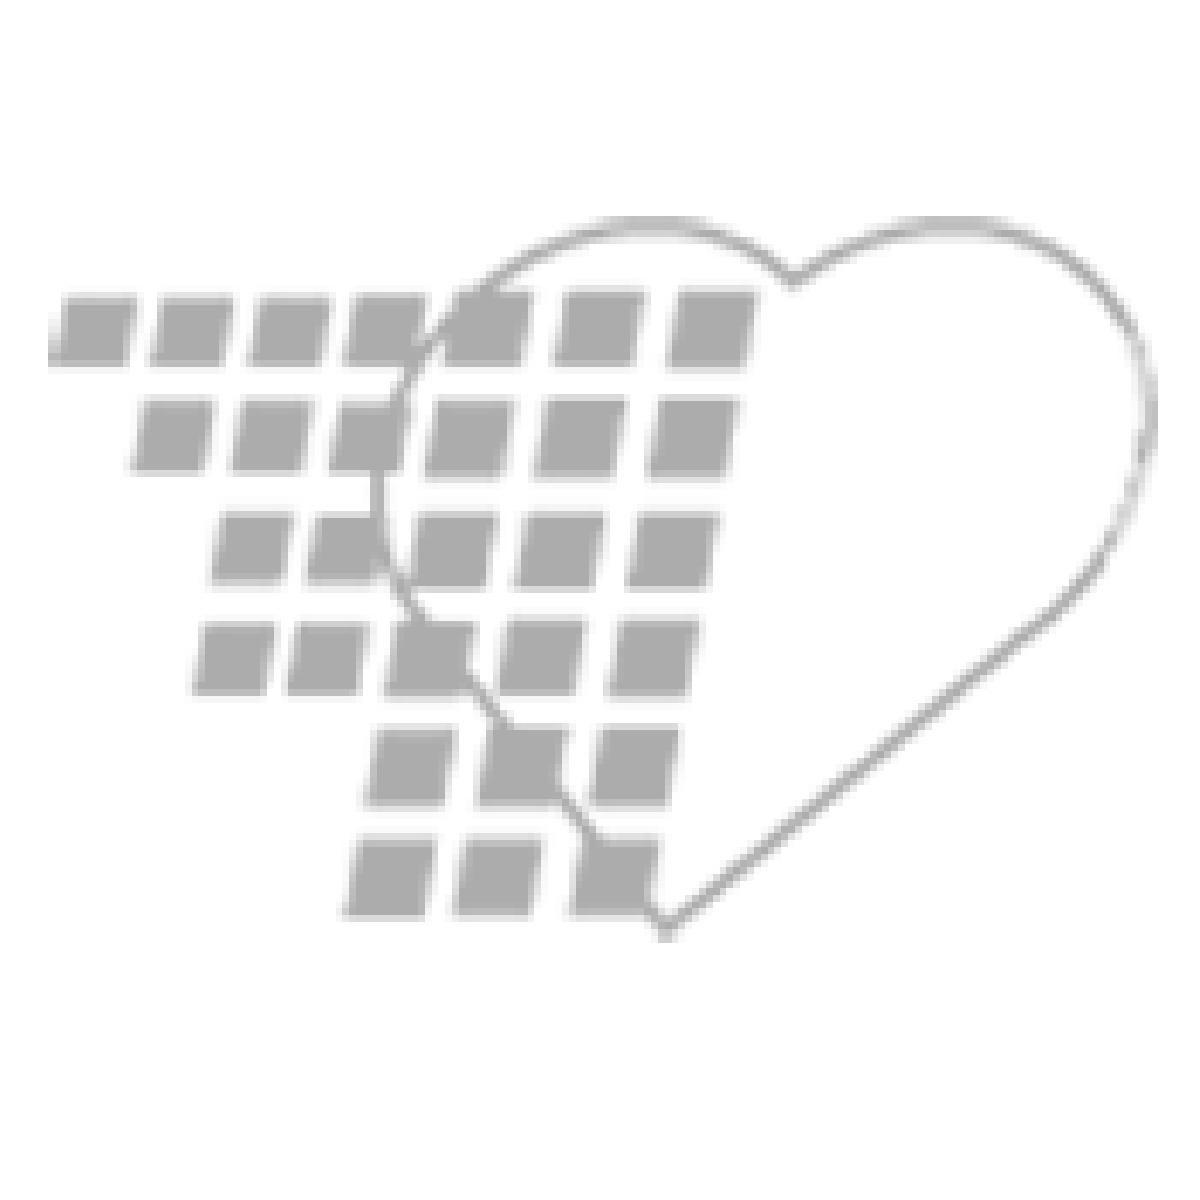 03-04-5382 PROVON® Green Certified Foam Hand Cleaner 1200mL refill for PROVON® TFX™ Dispenser 03-04-2745